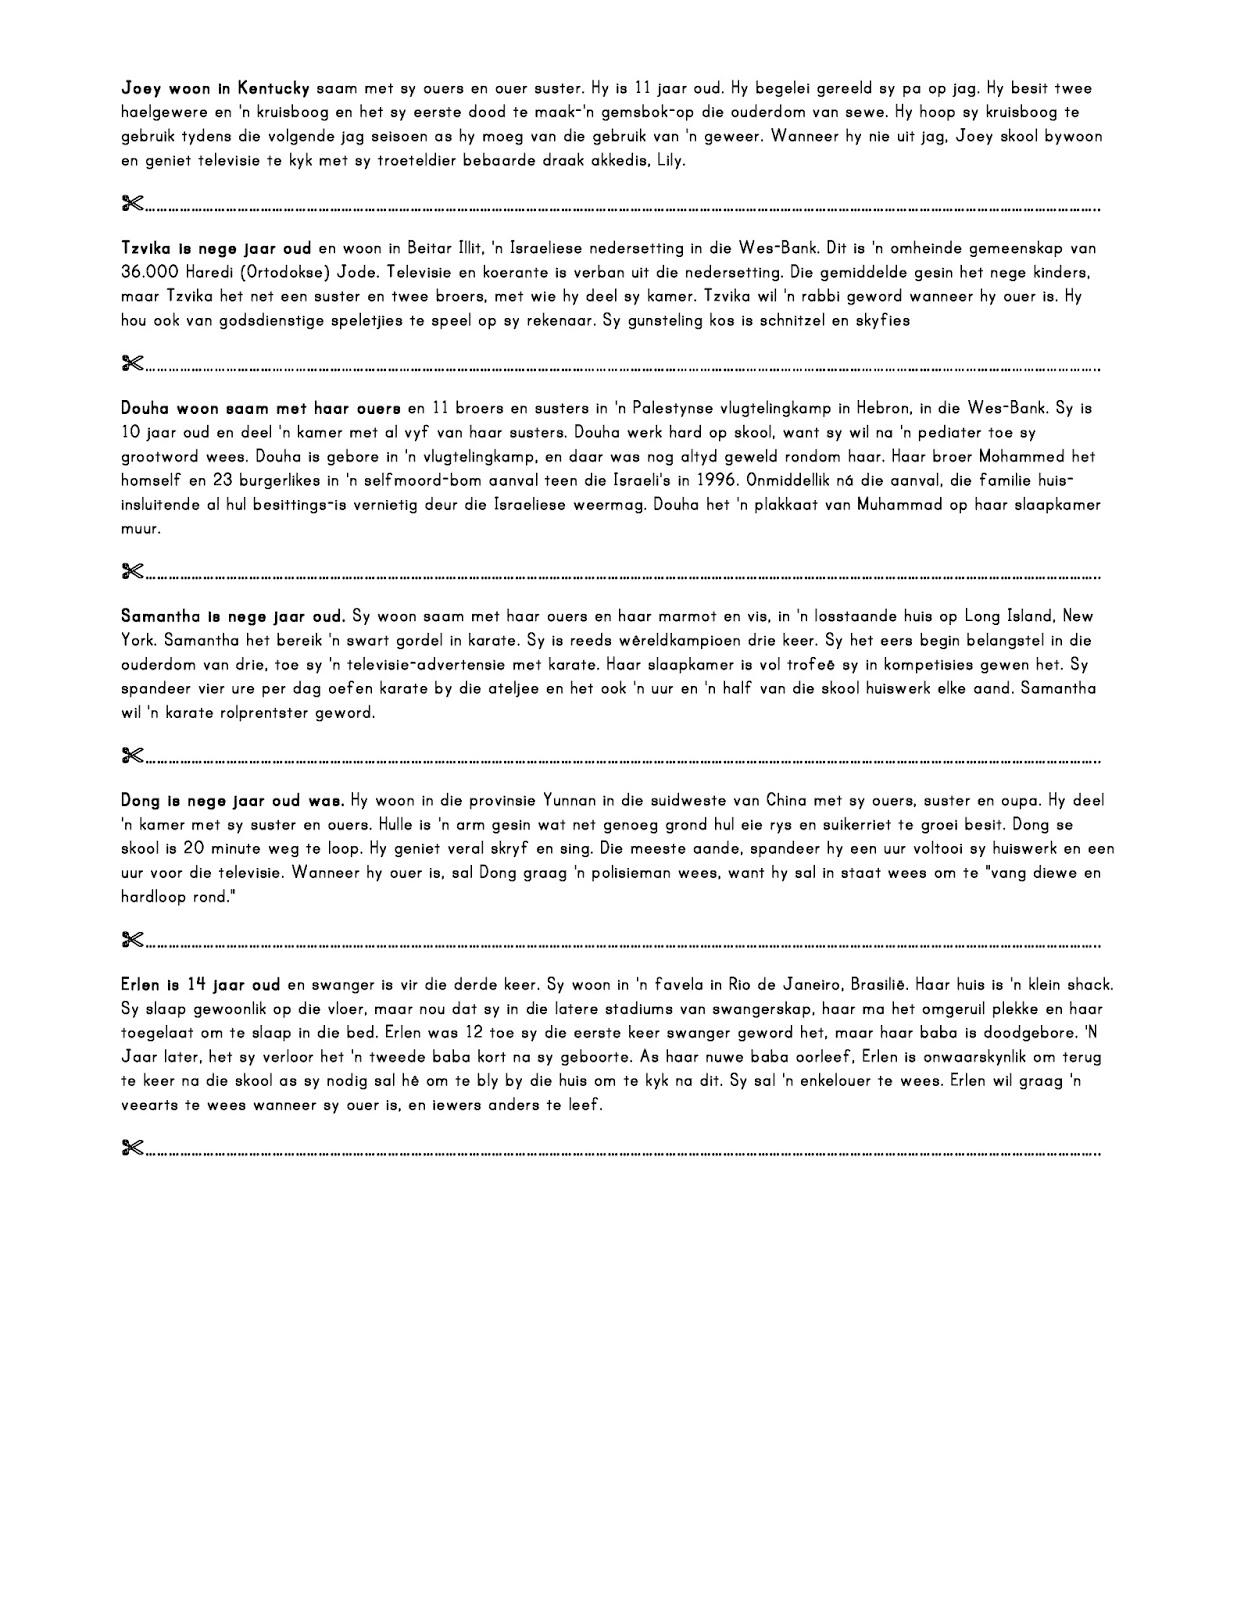 015 Essay Example Foto20text Page Jpg On Rare Children Children's Day In Kannada Telugu Full